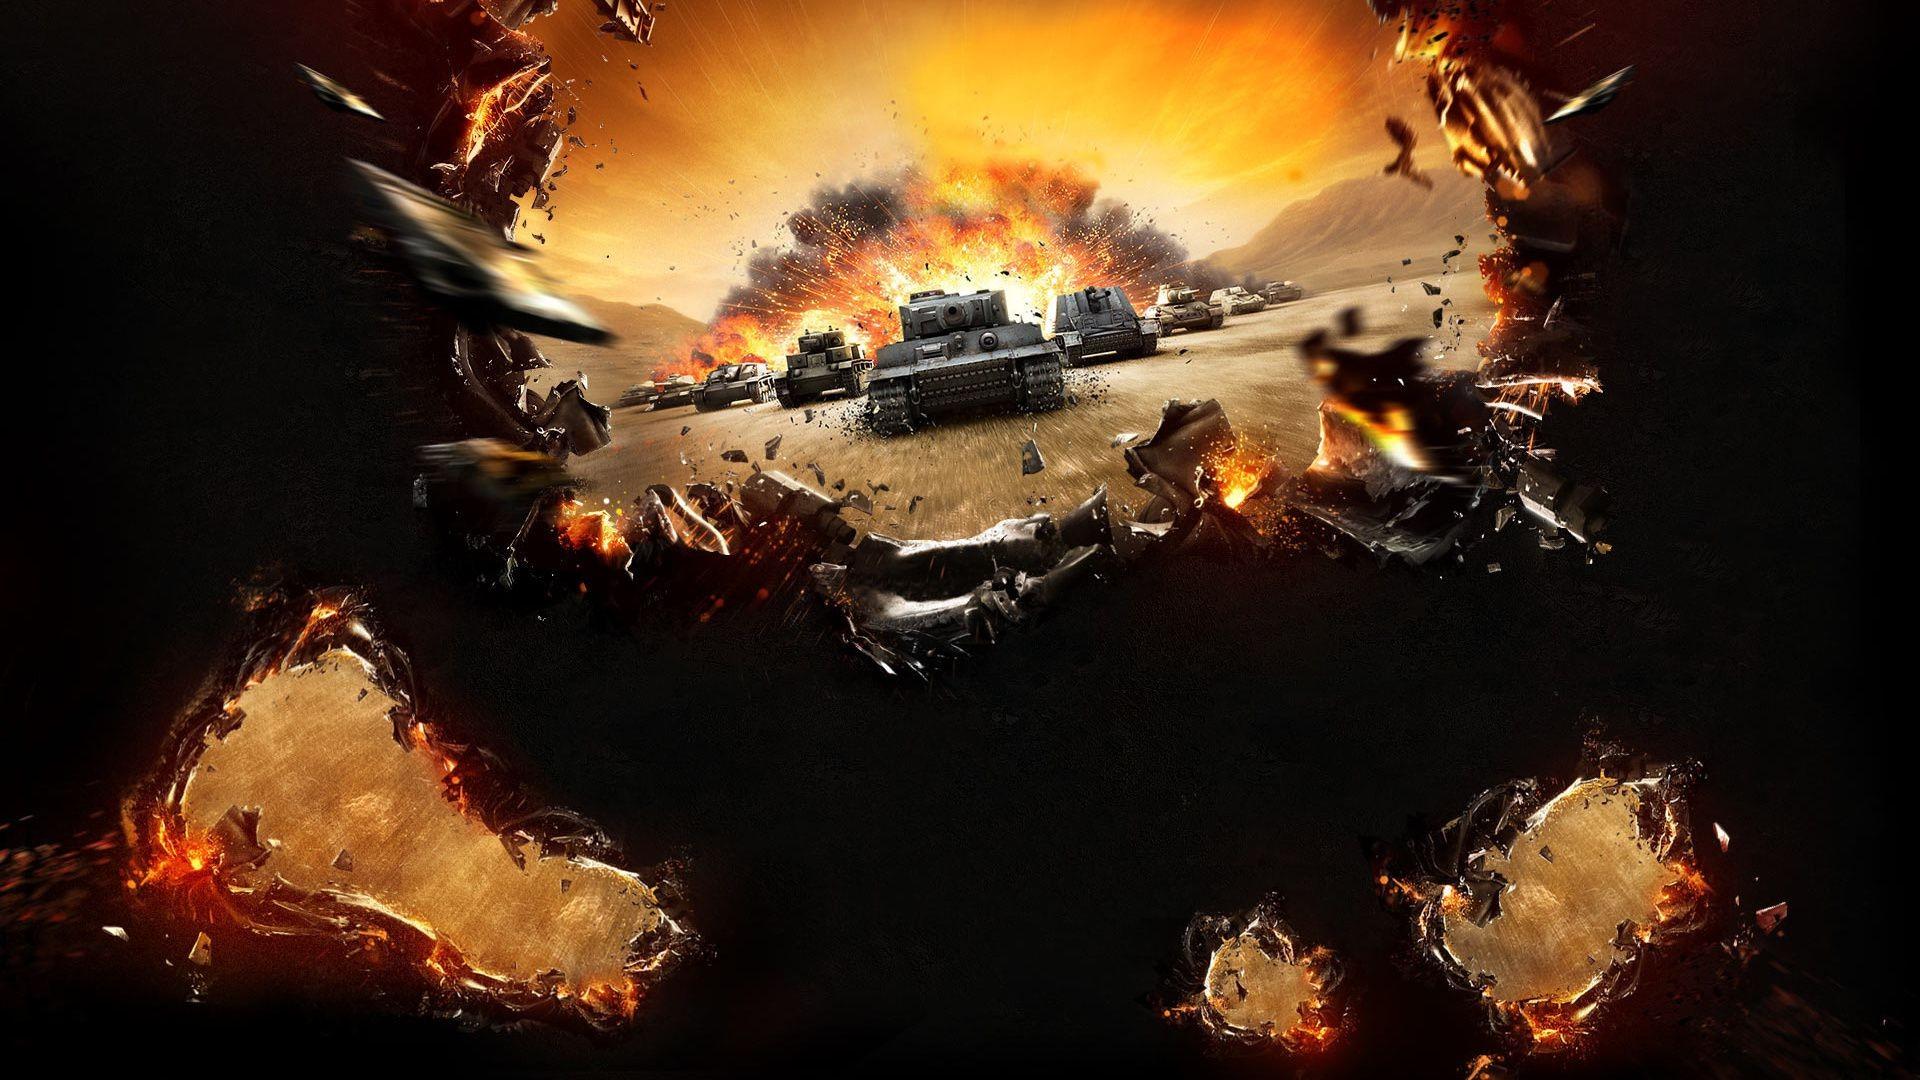 Взрыв и игре world of tanks - скачать обои на ...: million-wallpapers.ru/wallpaper/vzryv-i-igre-world-of-tanks/id/5082